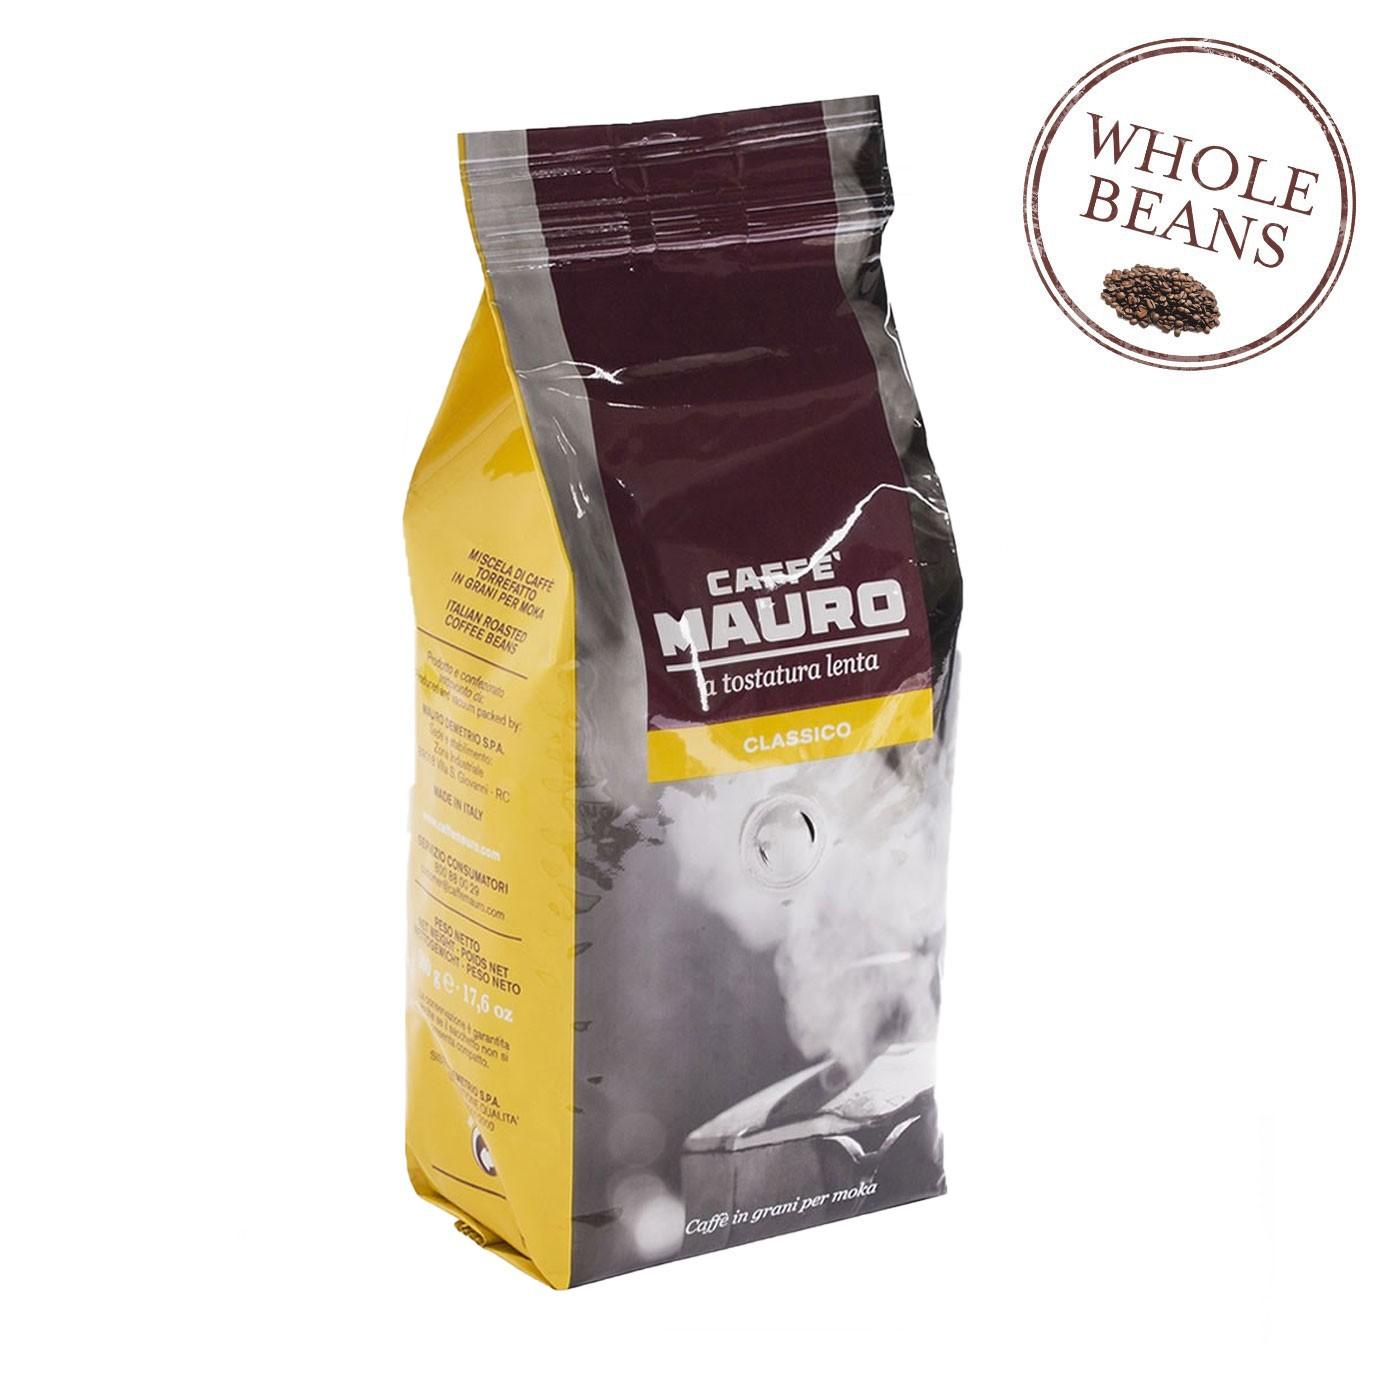 Classico Whole Coffee Beans 17.6 oz